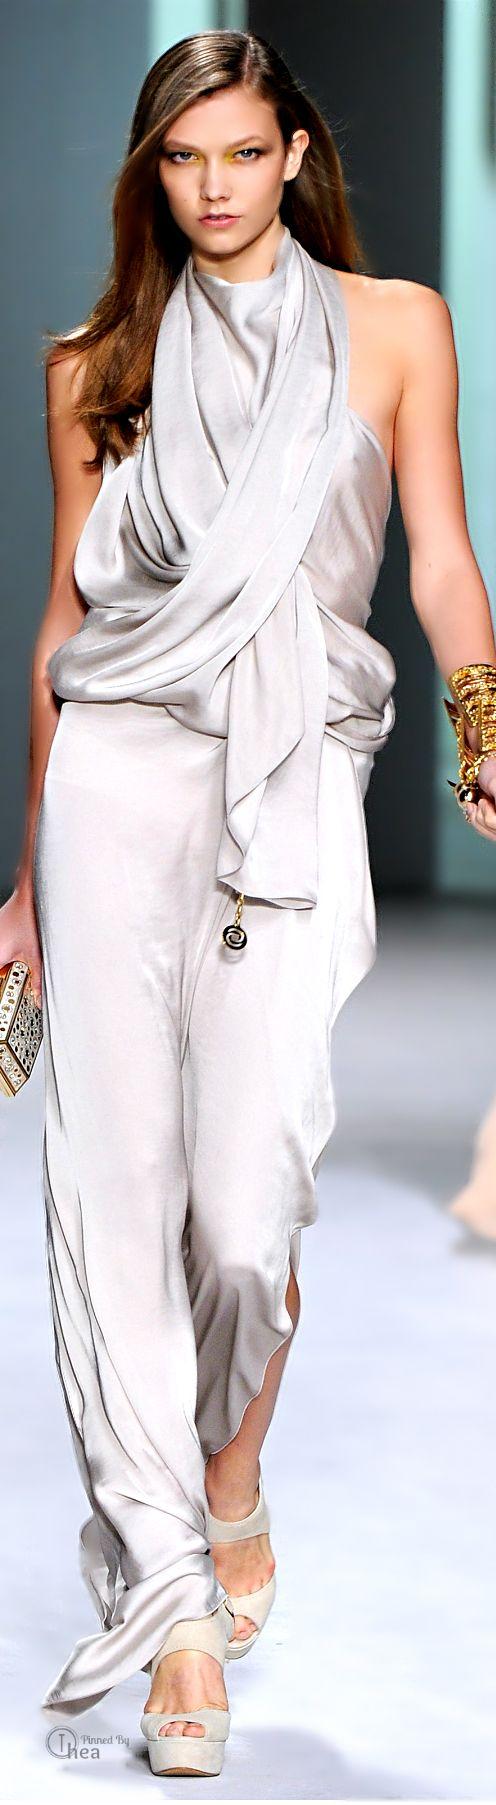 Karlie Kloss - The Hottest Runway Model | ELIE SAAB ...